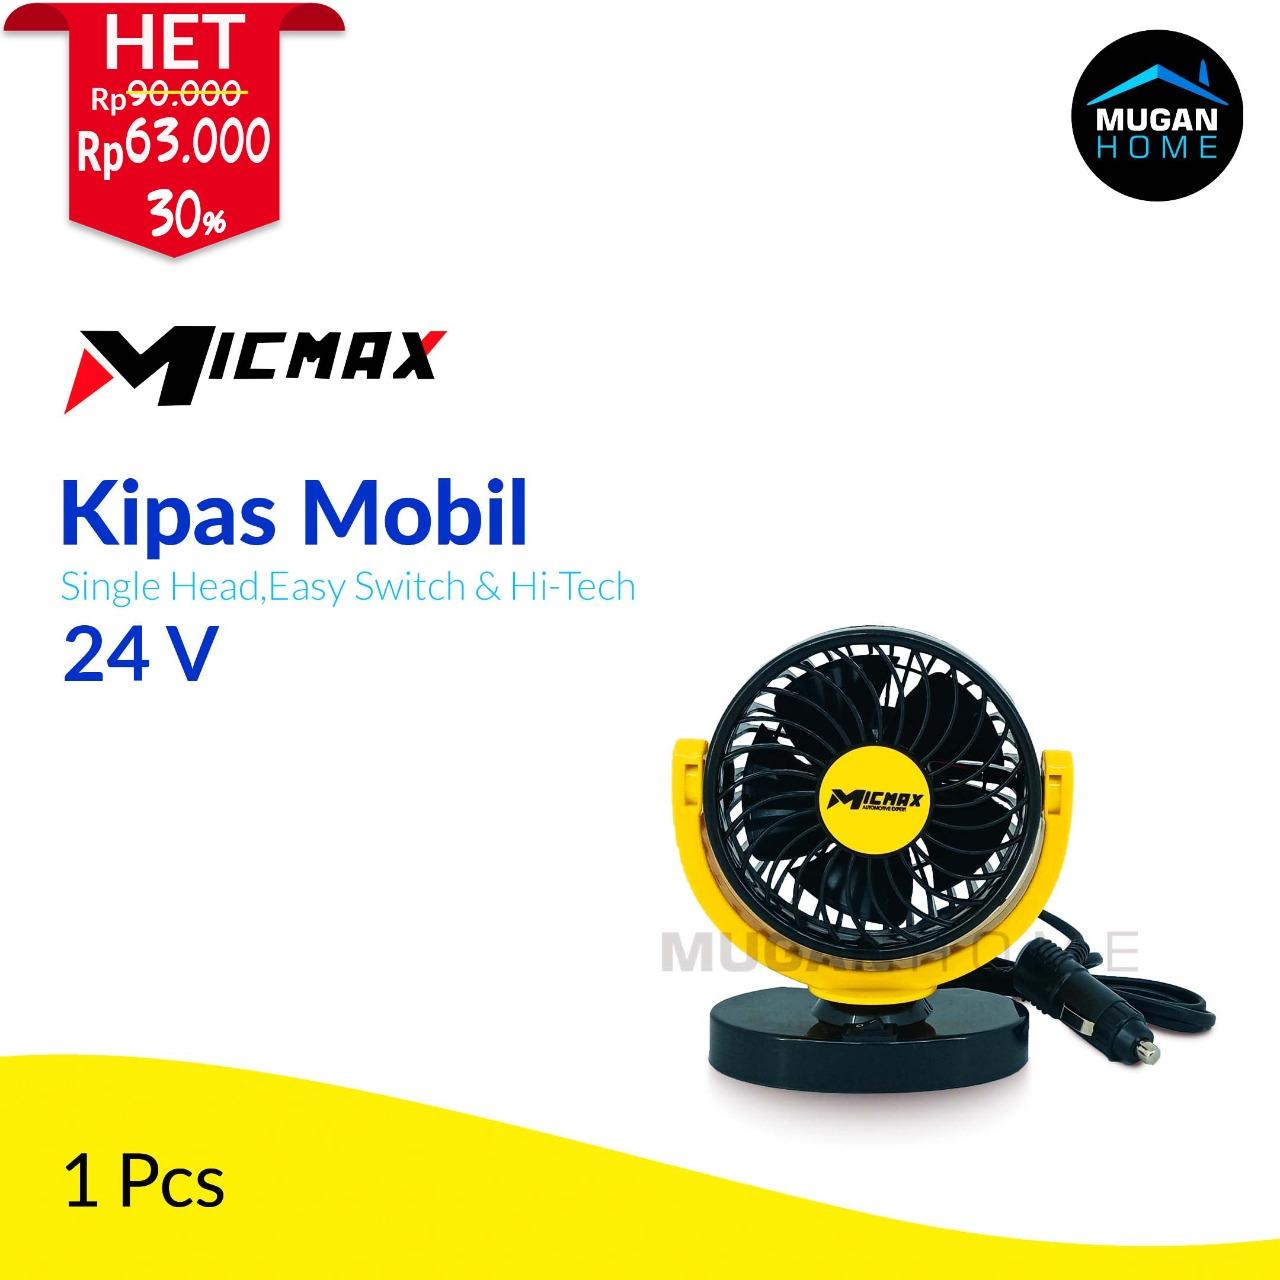 MICMAX SINGLE HEAD VEHICLE FAN 24V MX-S624